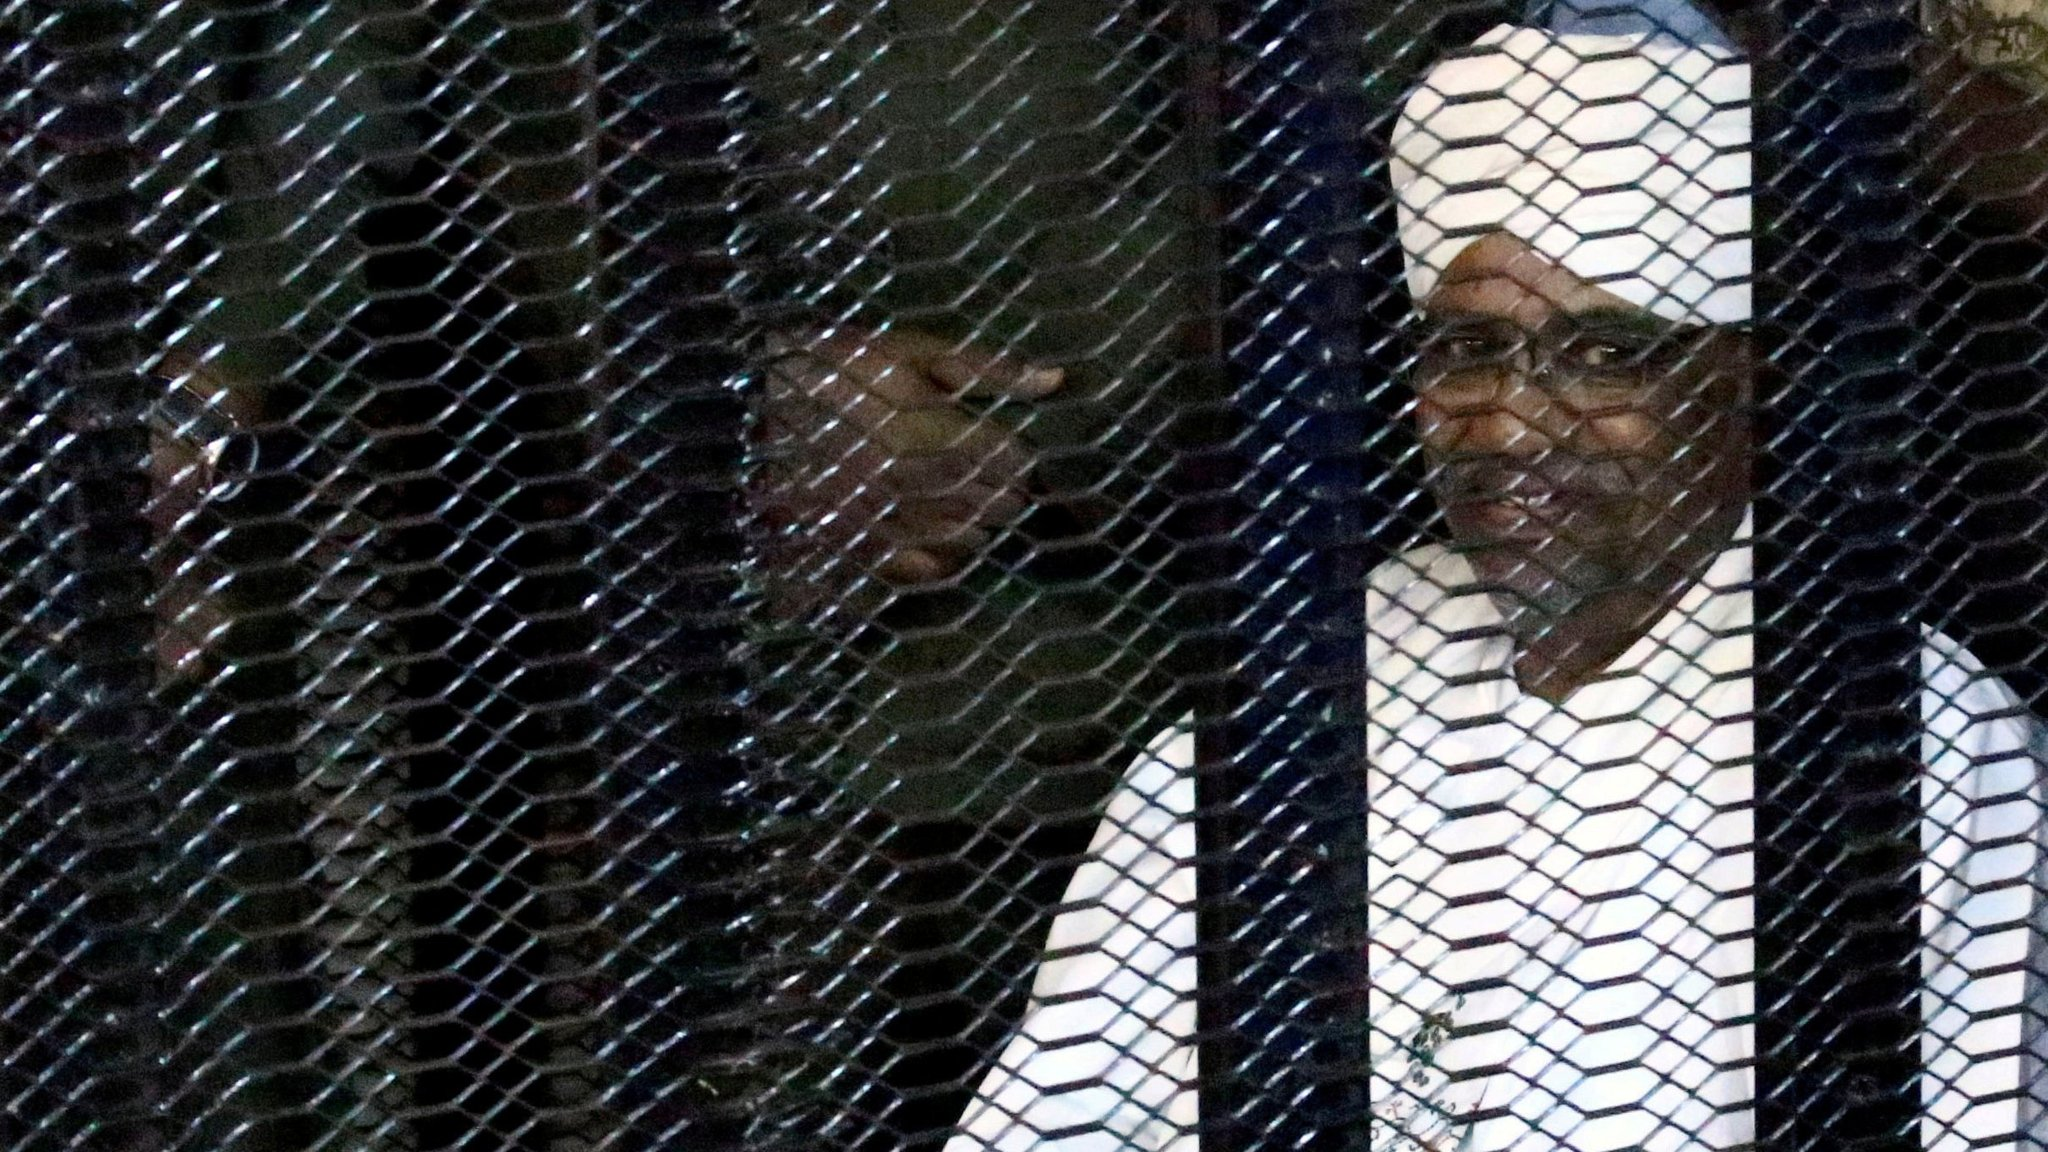 Sudan's Omar al Bashir faces court reckoning